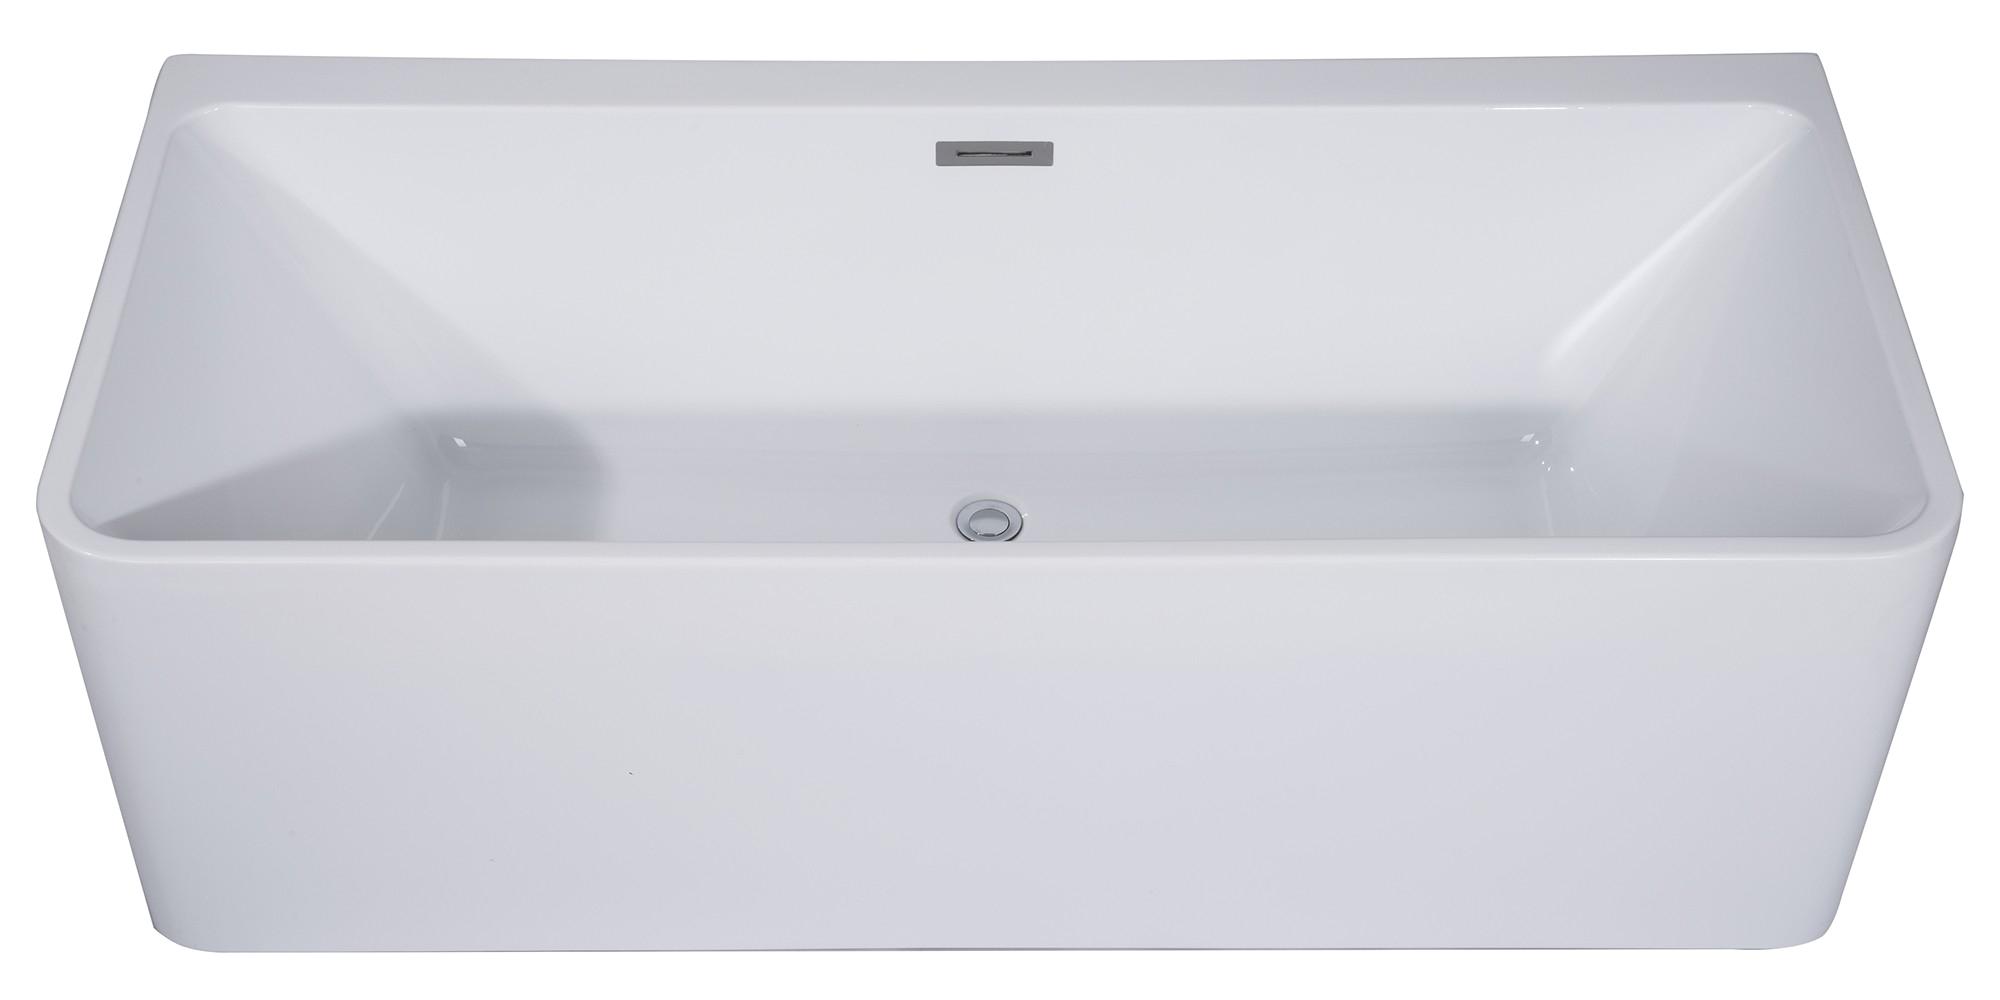 alfi brand ab8858 59 inch white rectangular acrylic free standing soaking bathtub